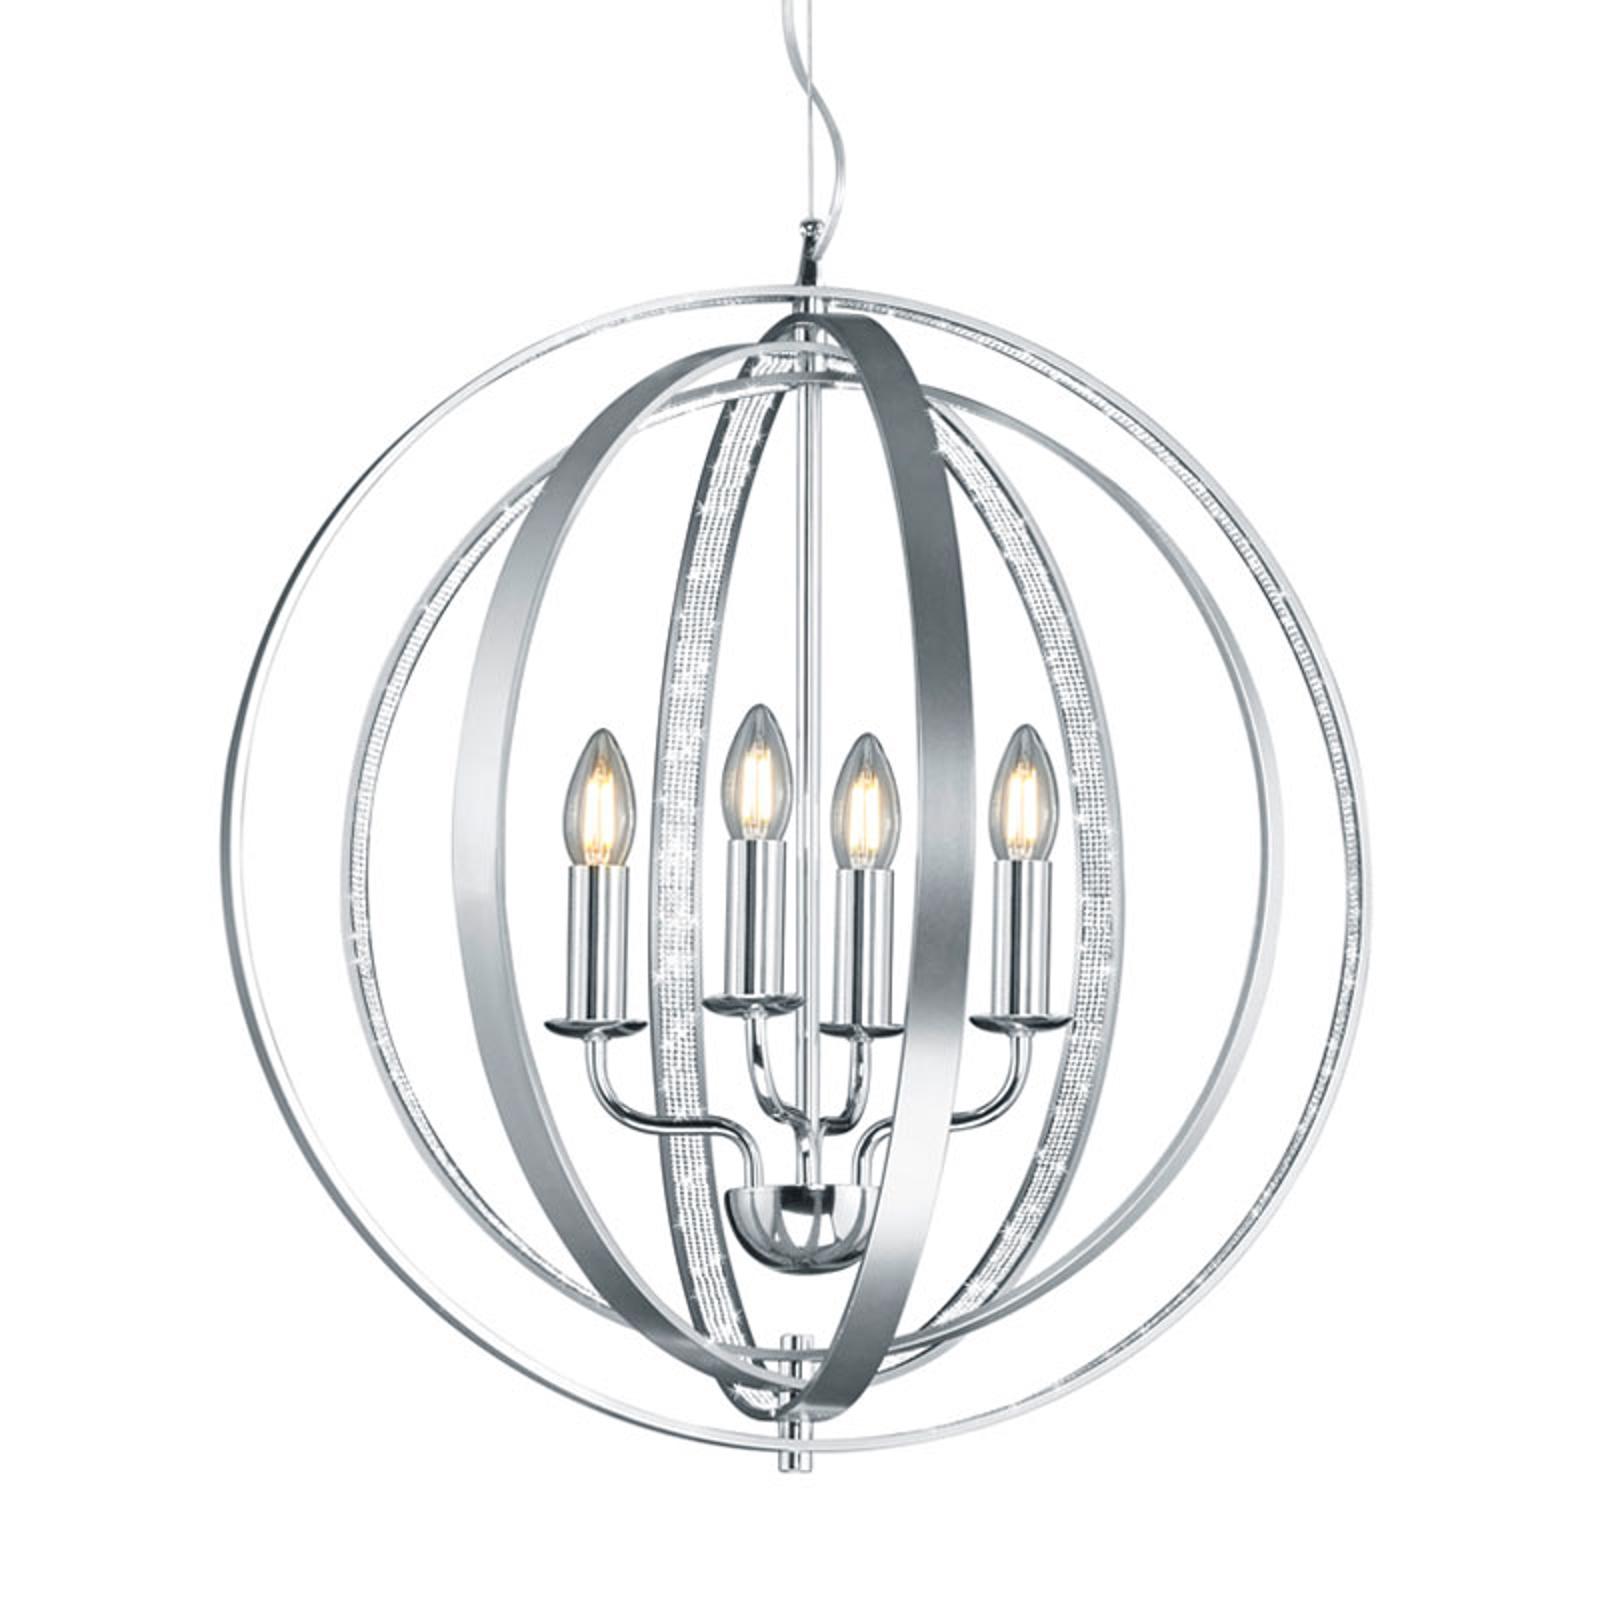 Bolronde hanglamp Candela in aluminium en chroom